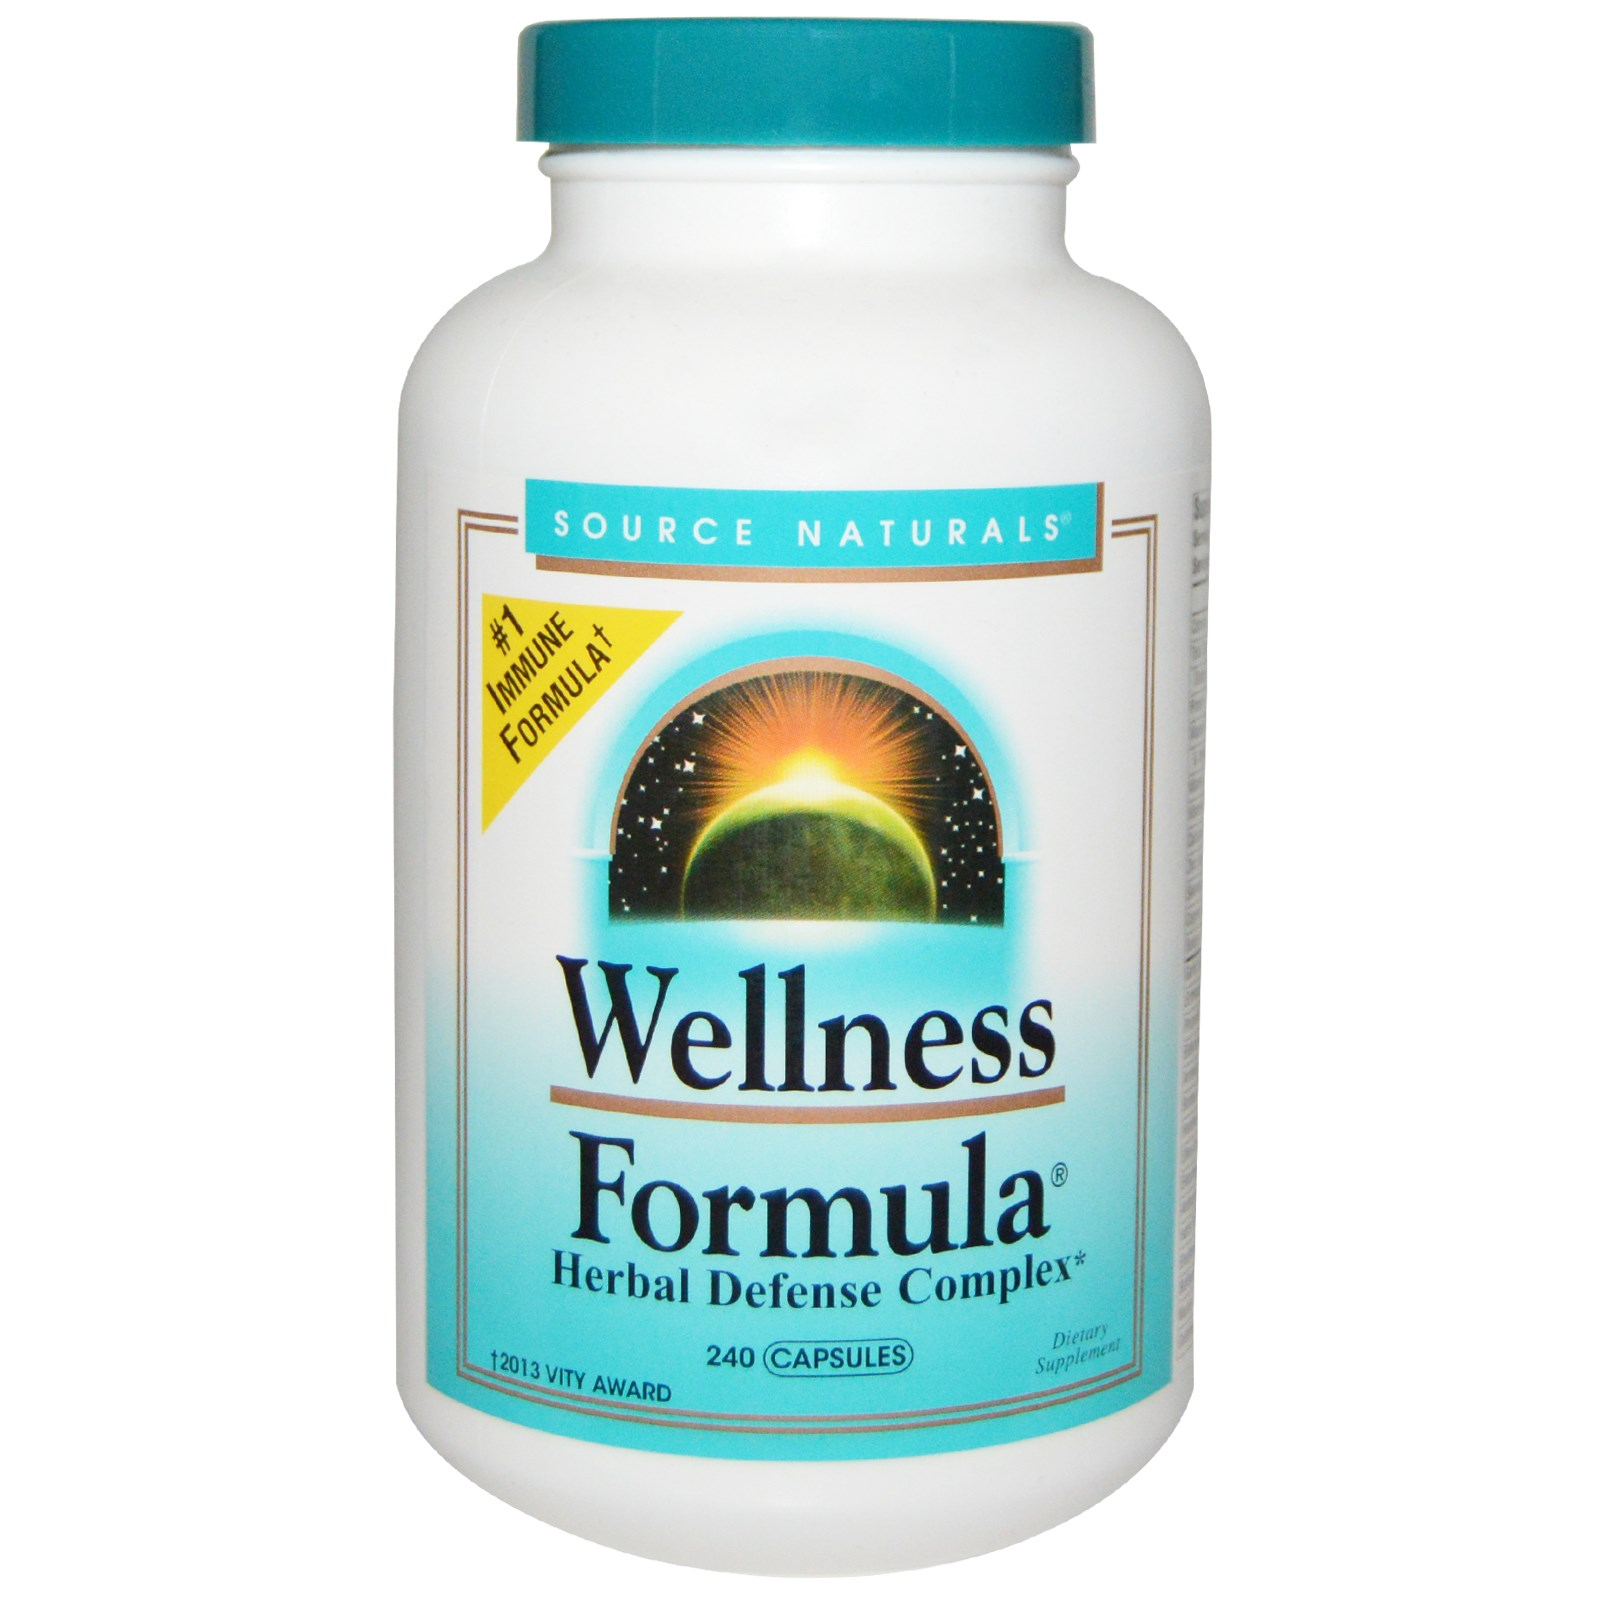 Source Naturals, Wellness(健康)のフォーミュラ, ハーブディフェンス複合体, 240カプセル